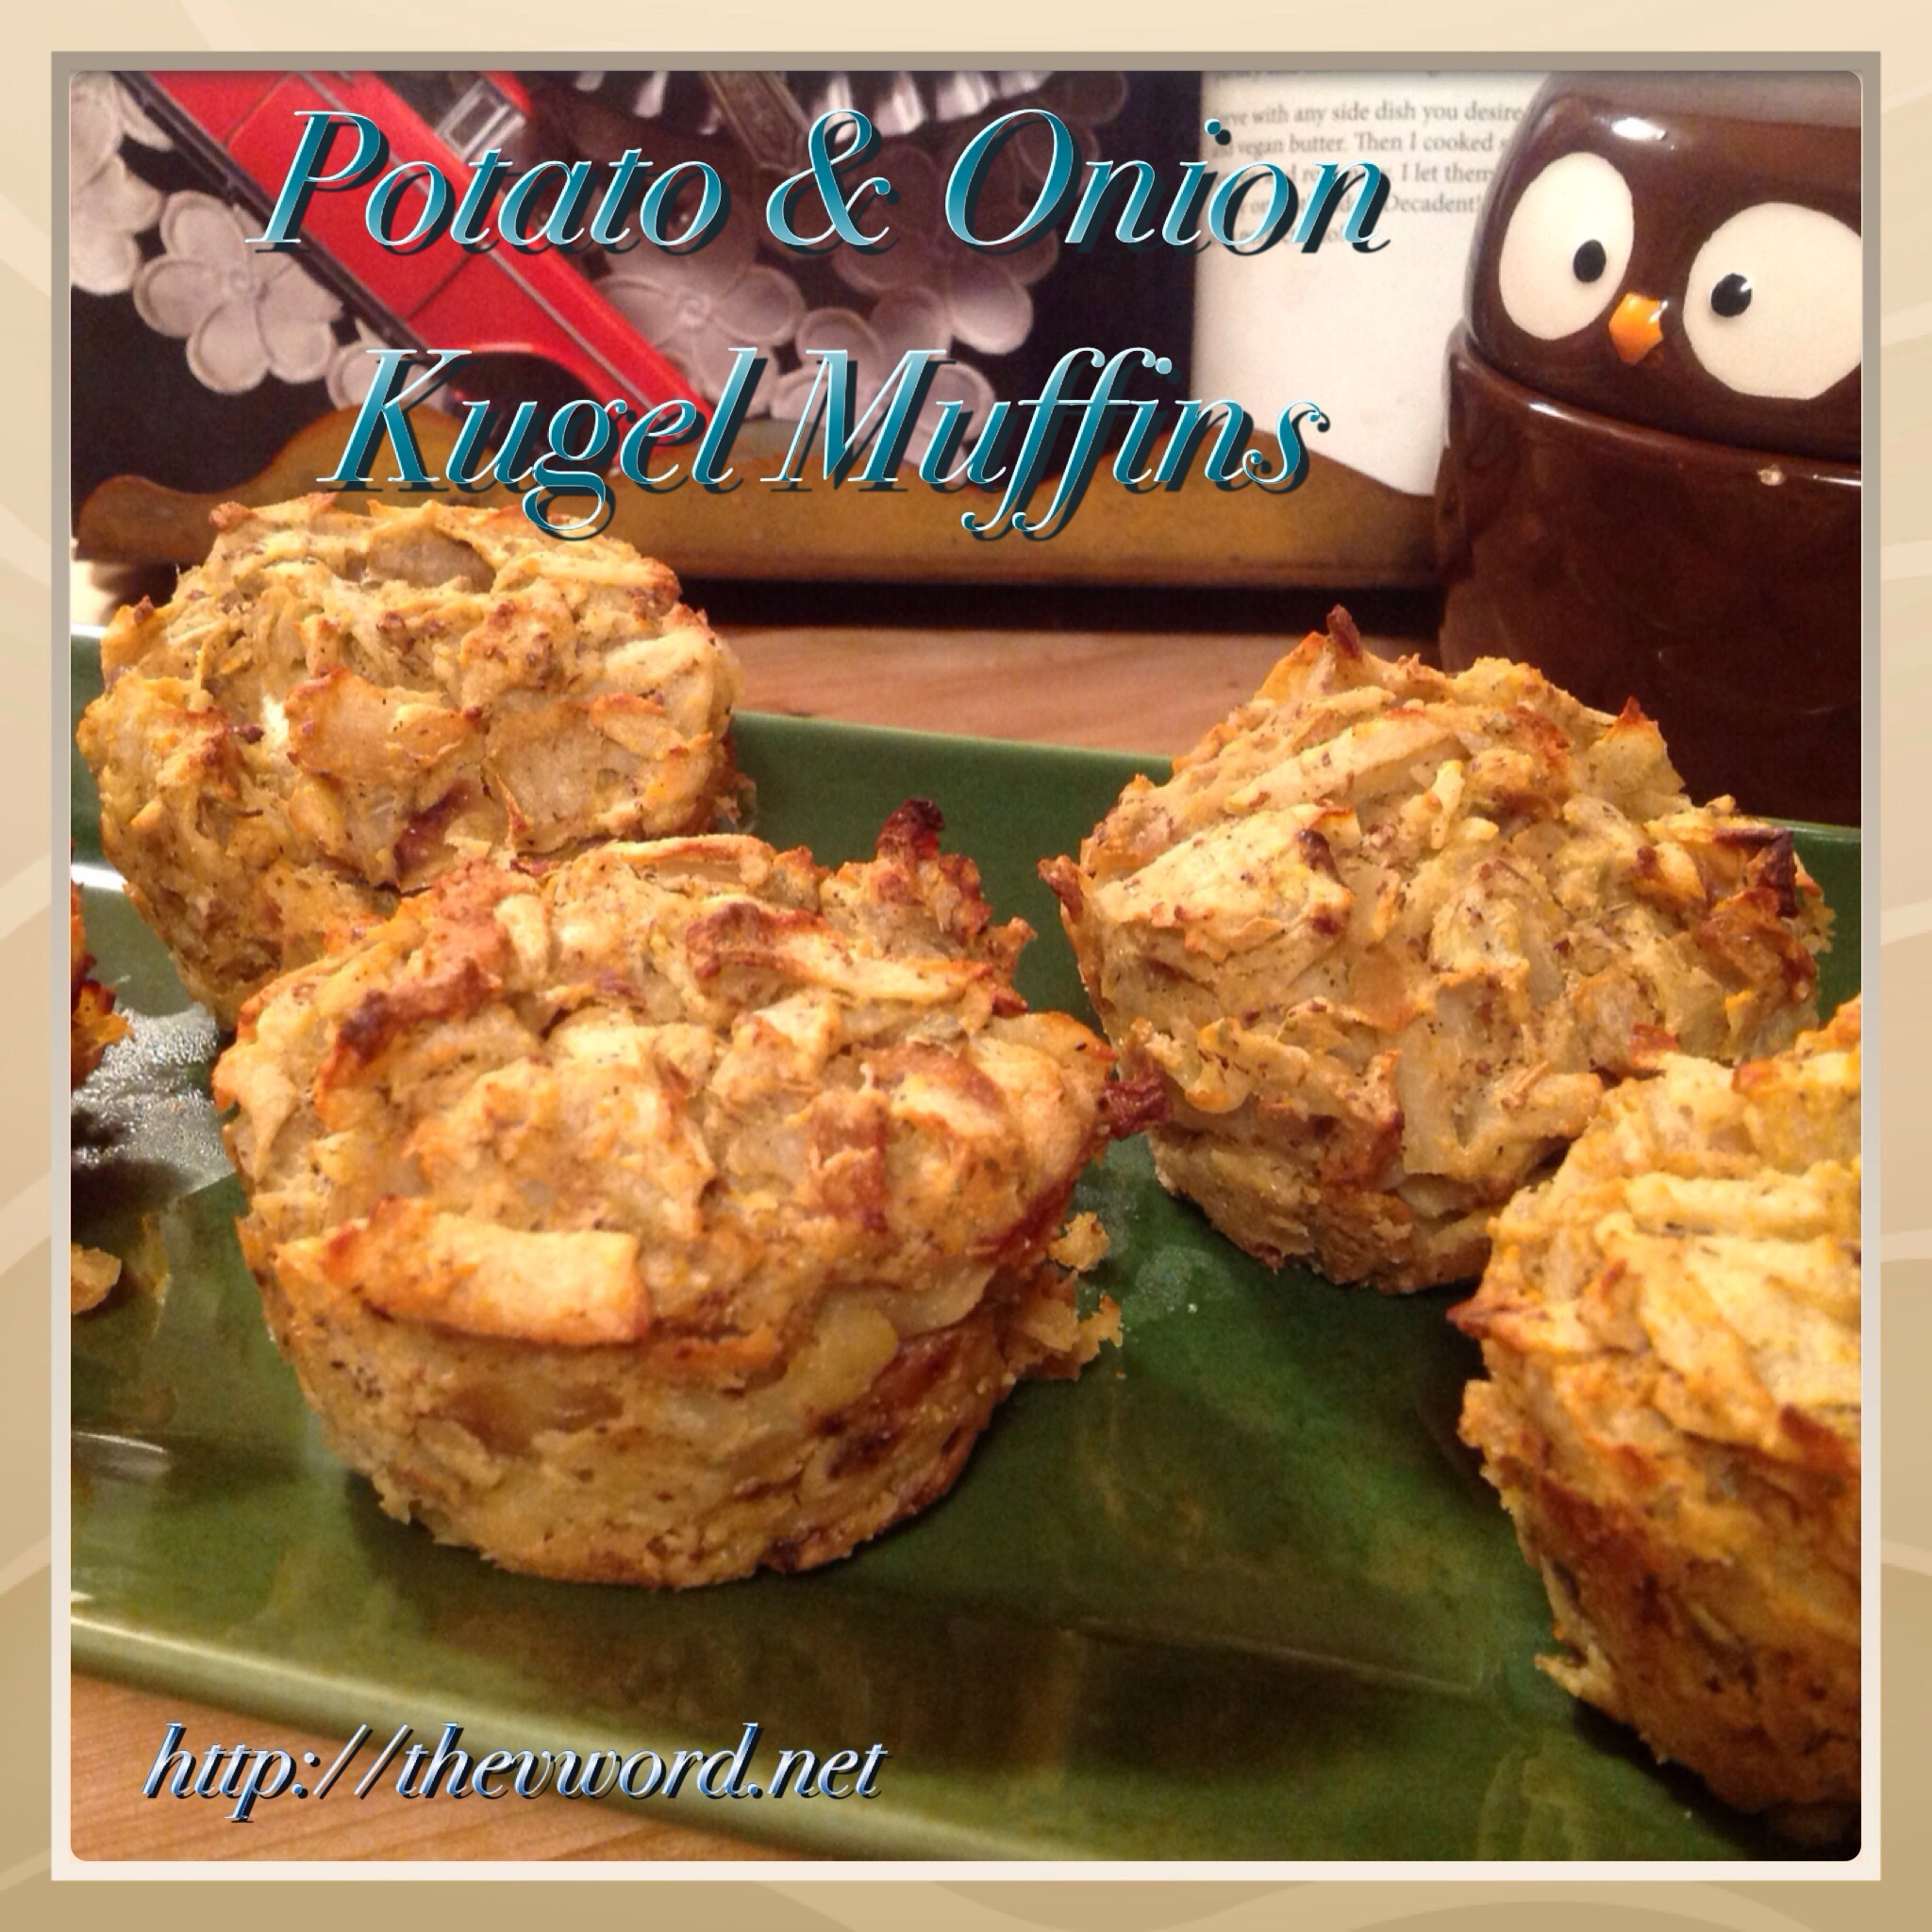 VeganMoFo #17: Potato and Onion Kugel with Sauteed Apples Done 2 Ways ...